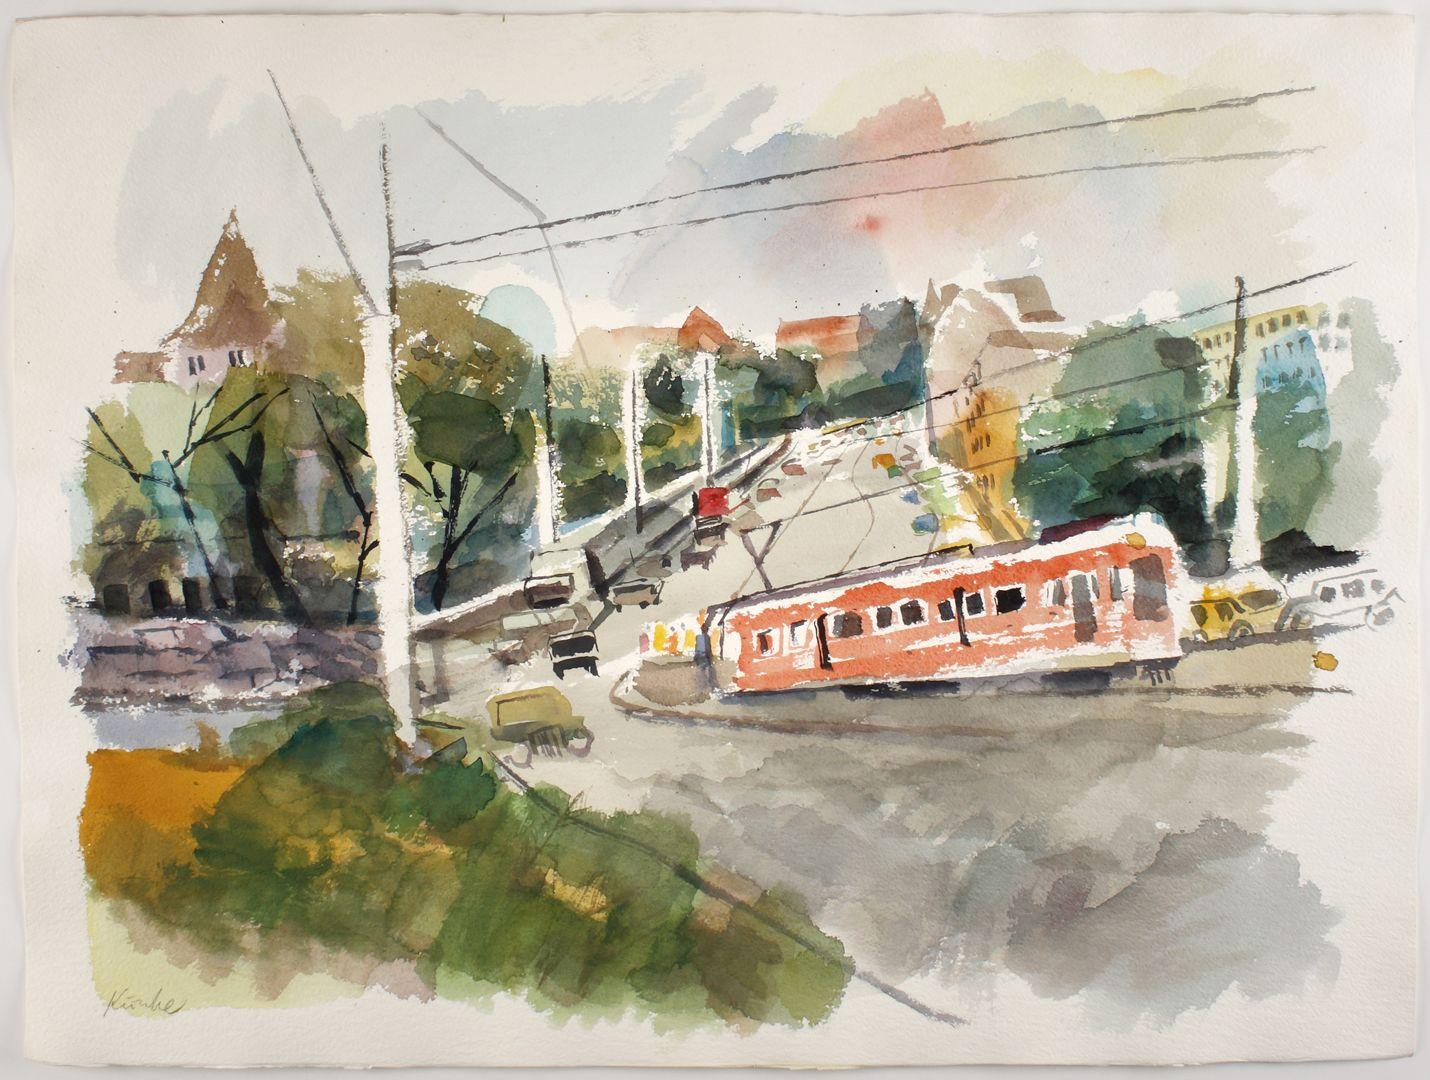 Tramway at the moat